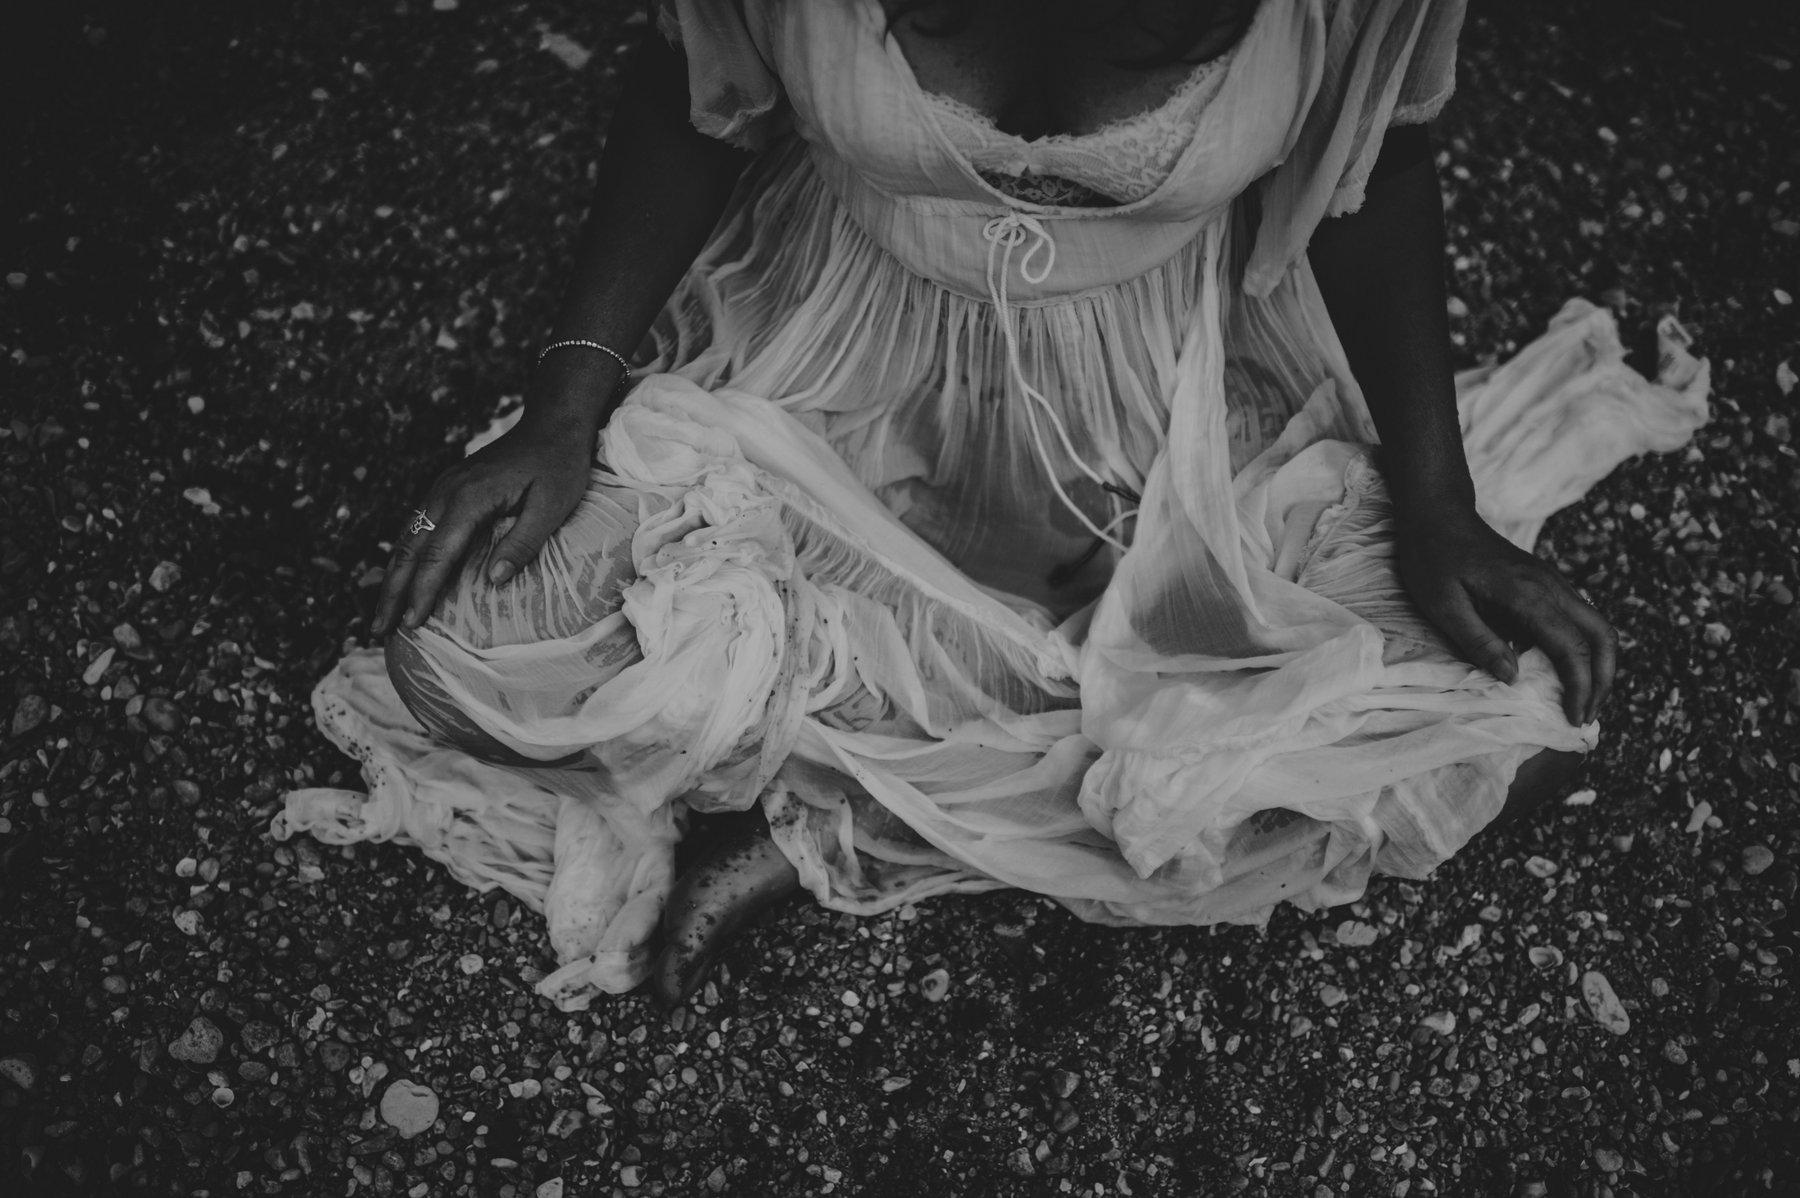 Woman by Michelle Gardella